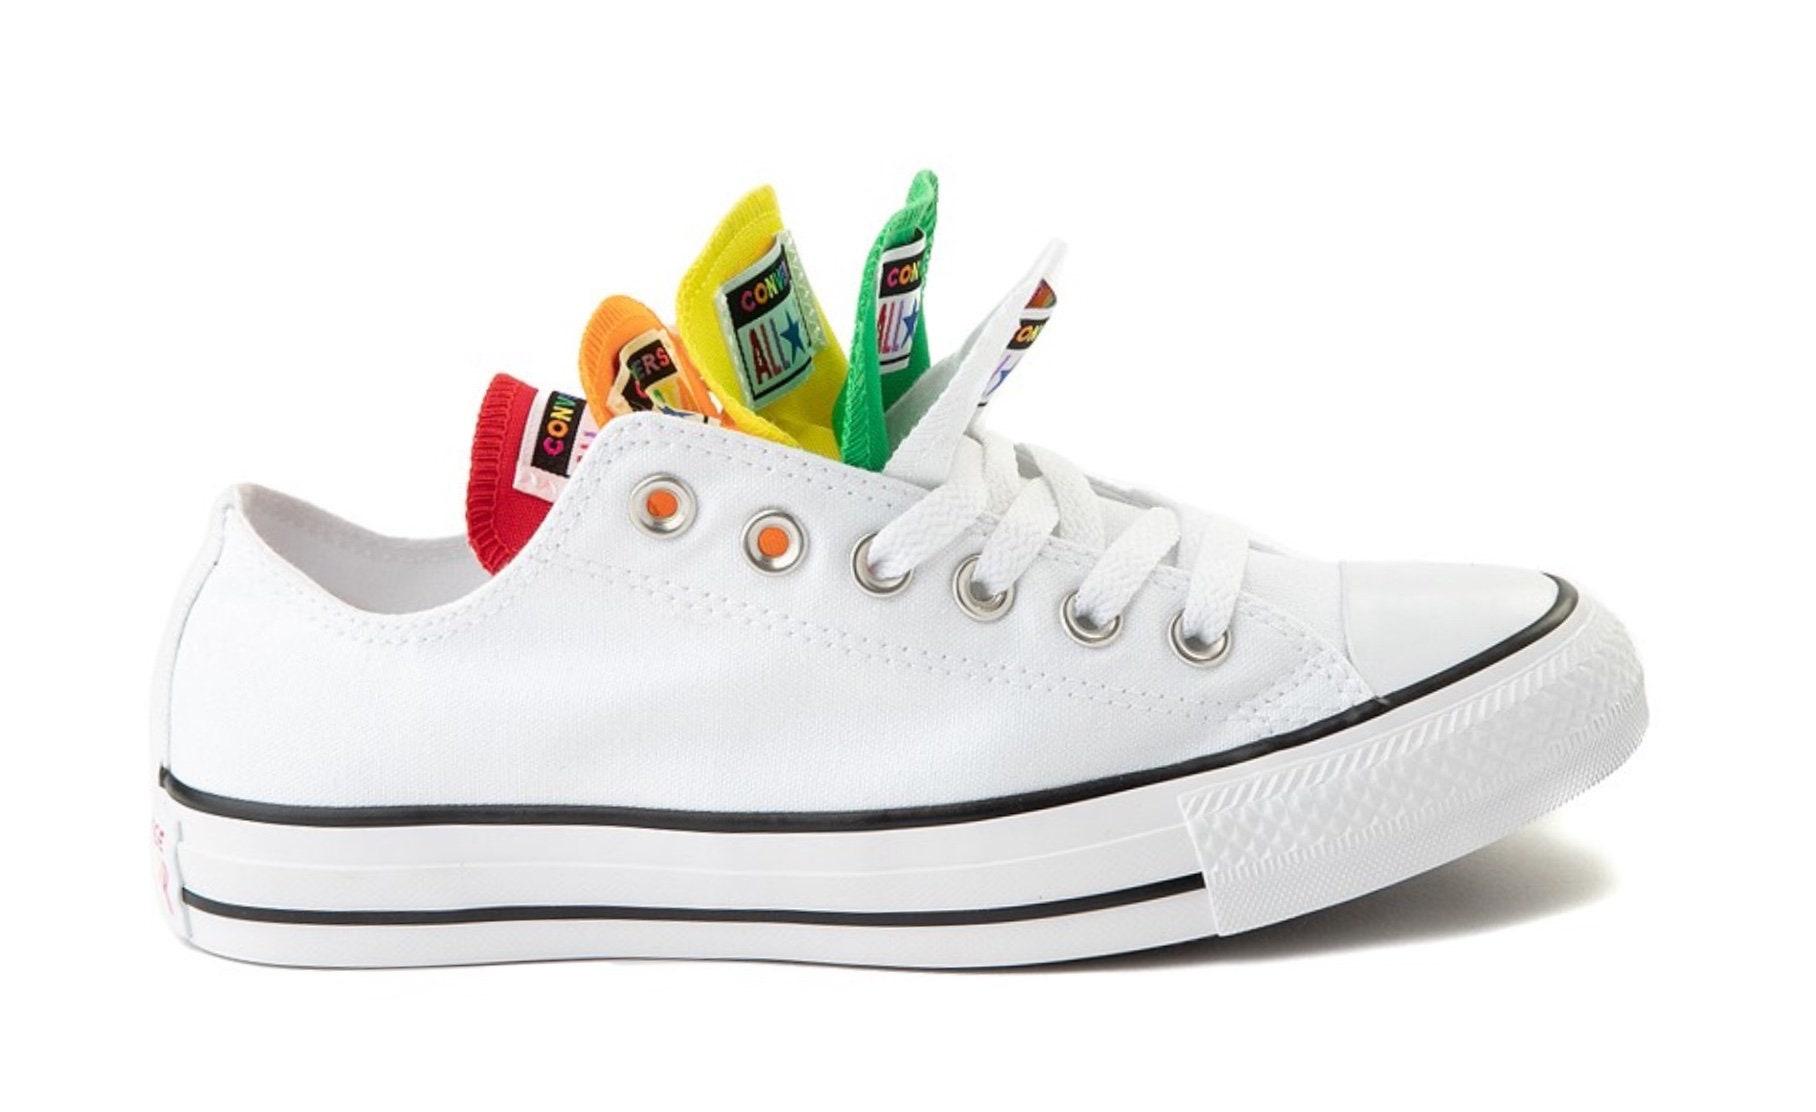 662a72a29df8b White Rainbow Converse Low Top Pride Multicolor Canvas w/ Swarovski ...